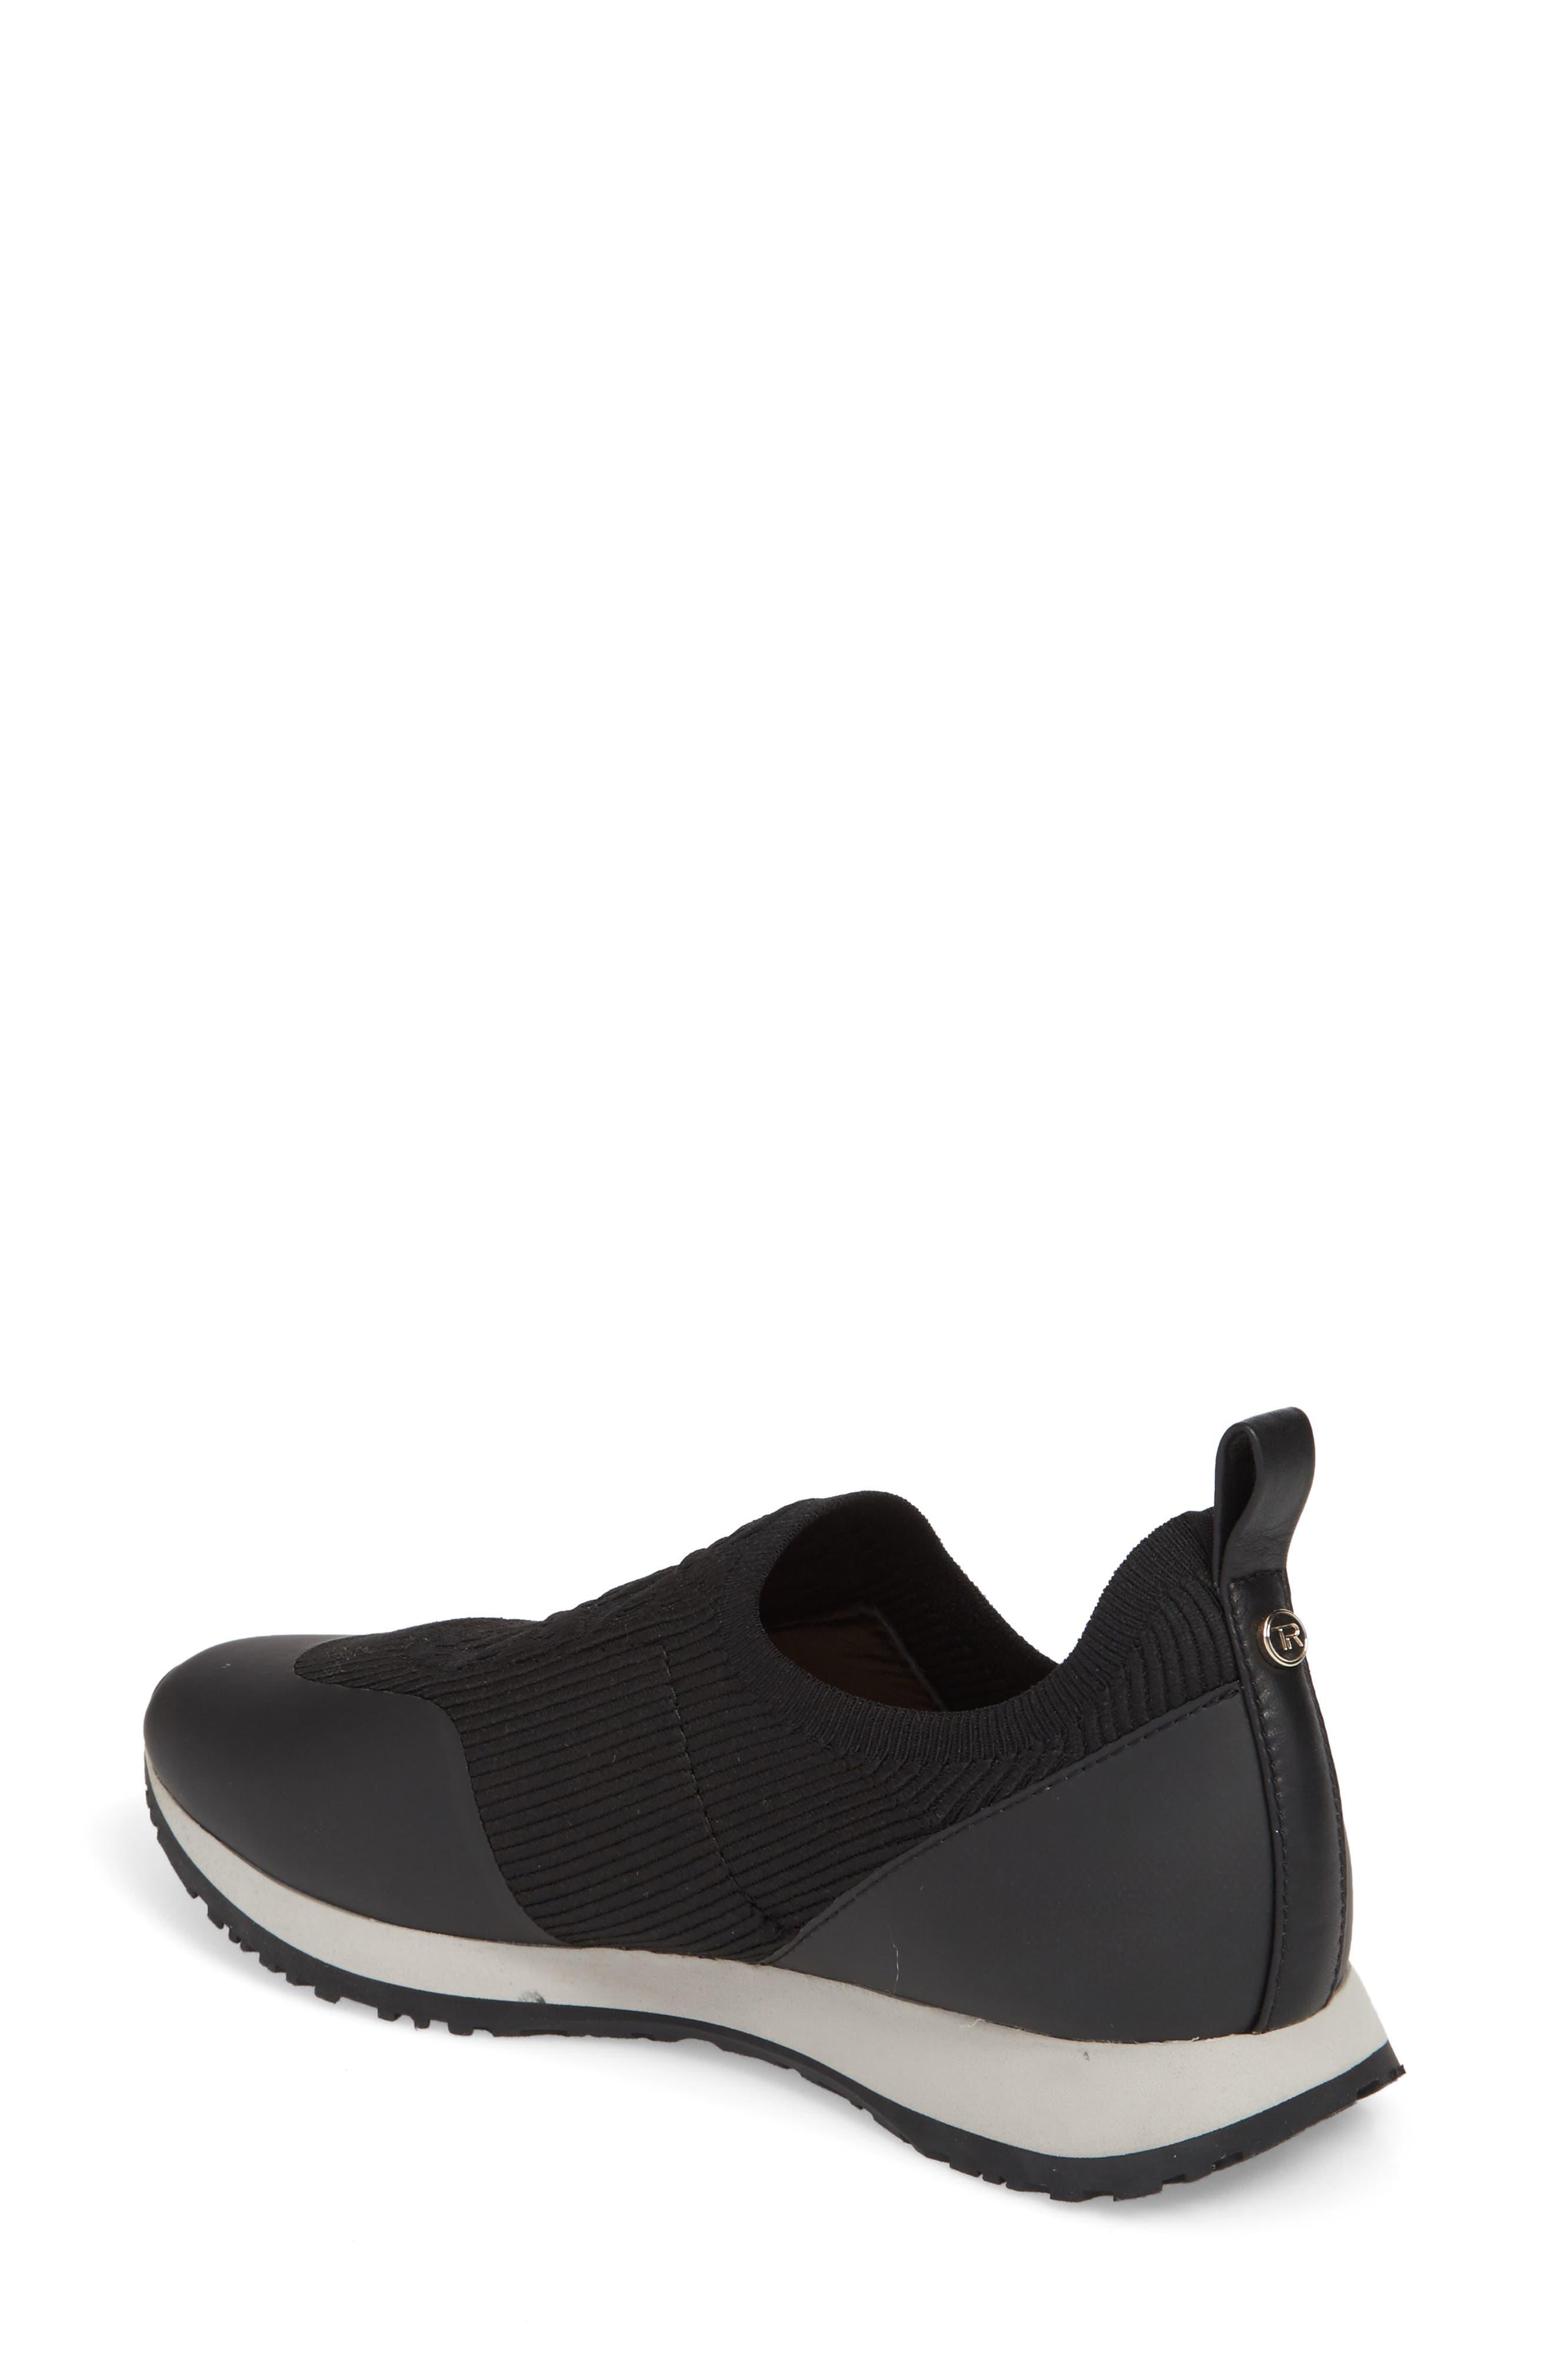 Cara Slip-On Sneaker,                             Alternate thumbnail 2, color,                             Black Fabric